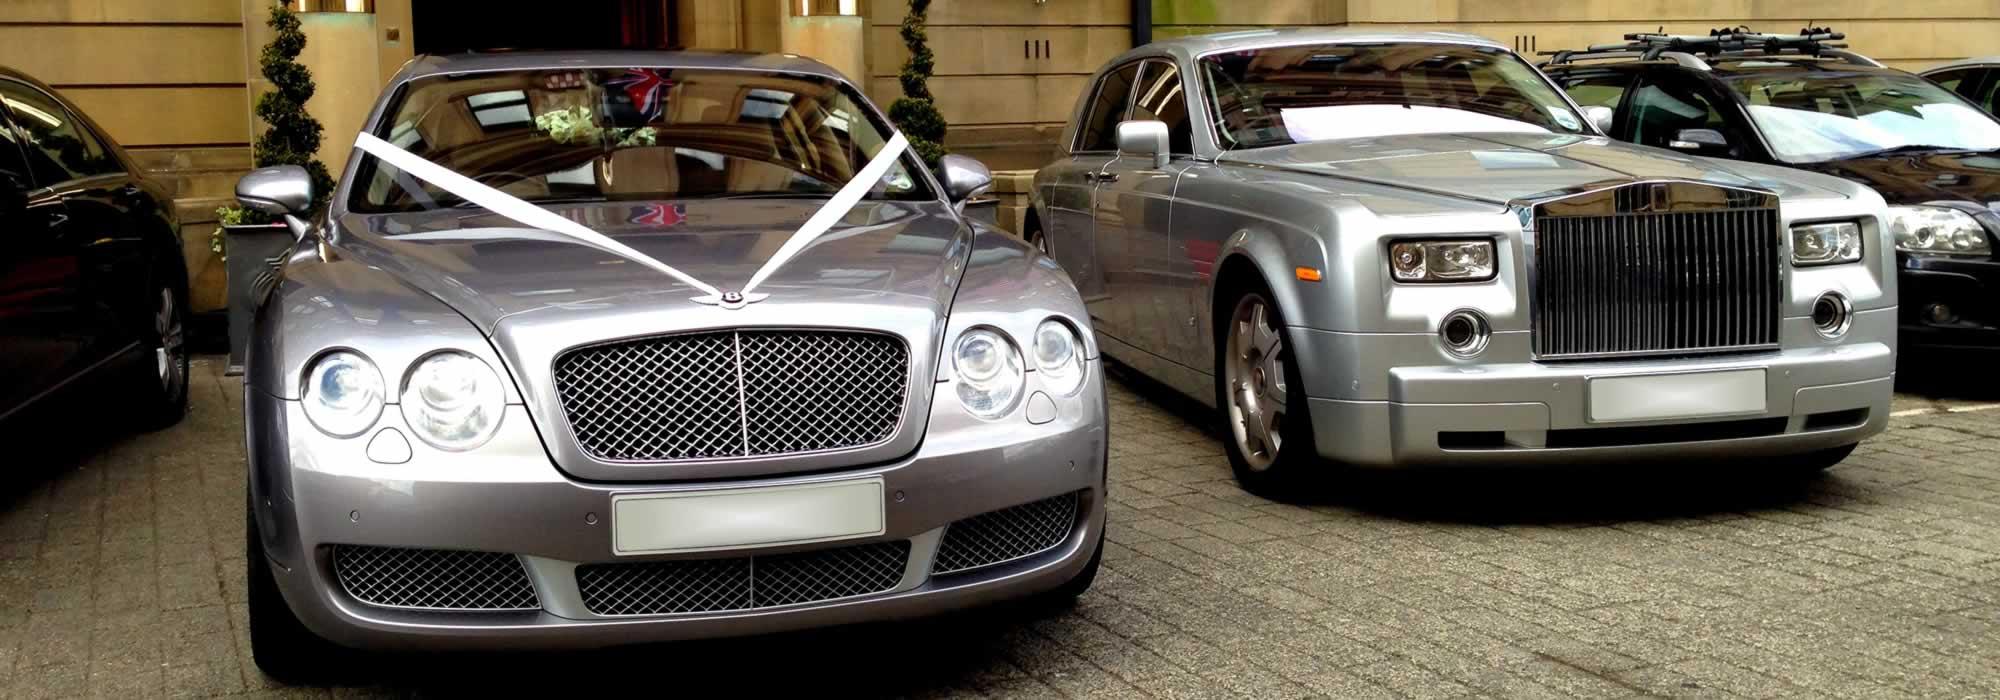 Bentley Flying Spur Silver Herts Rollers